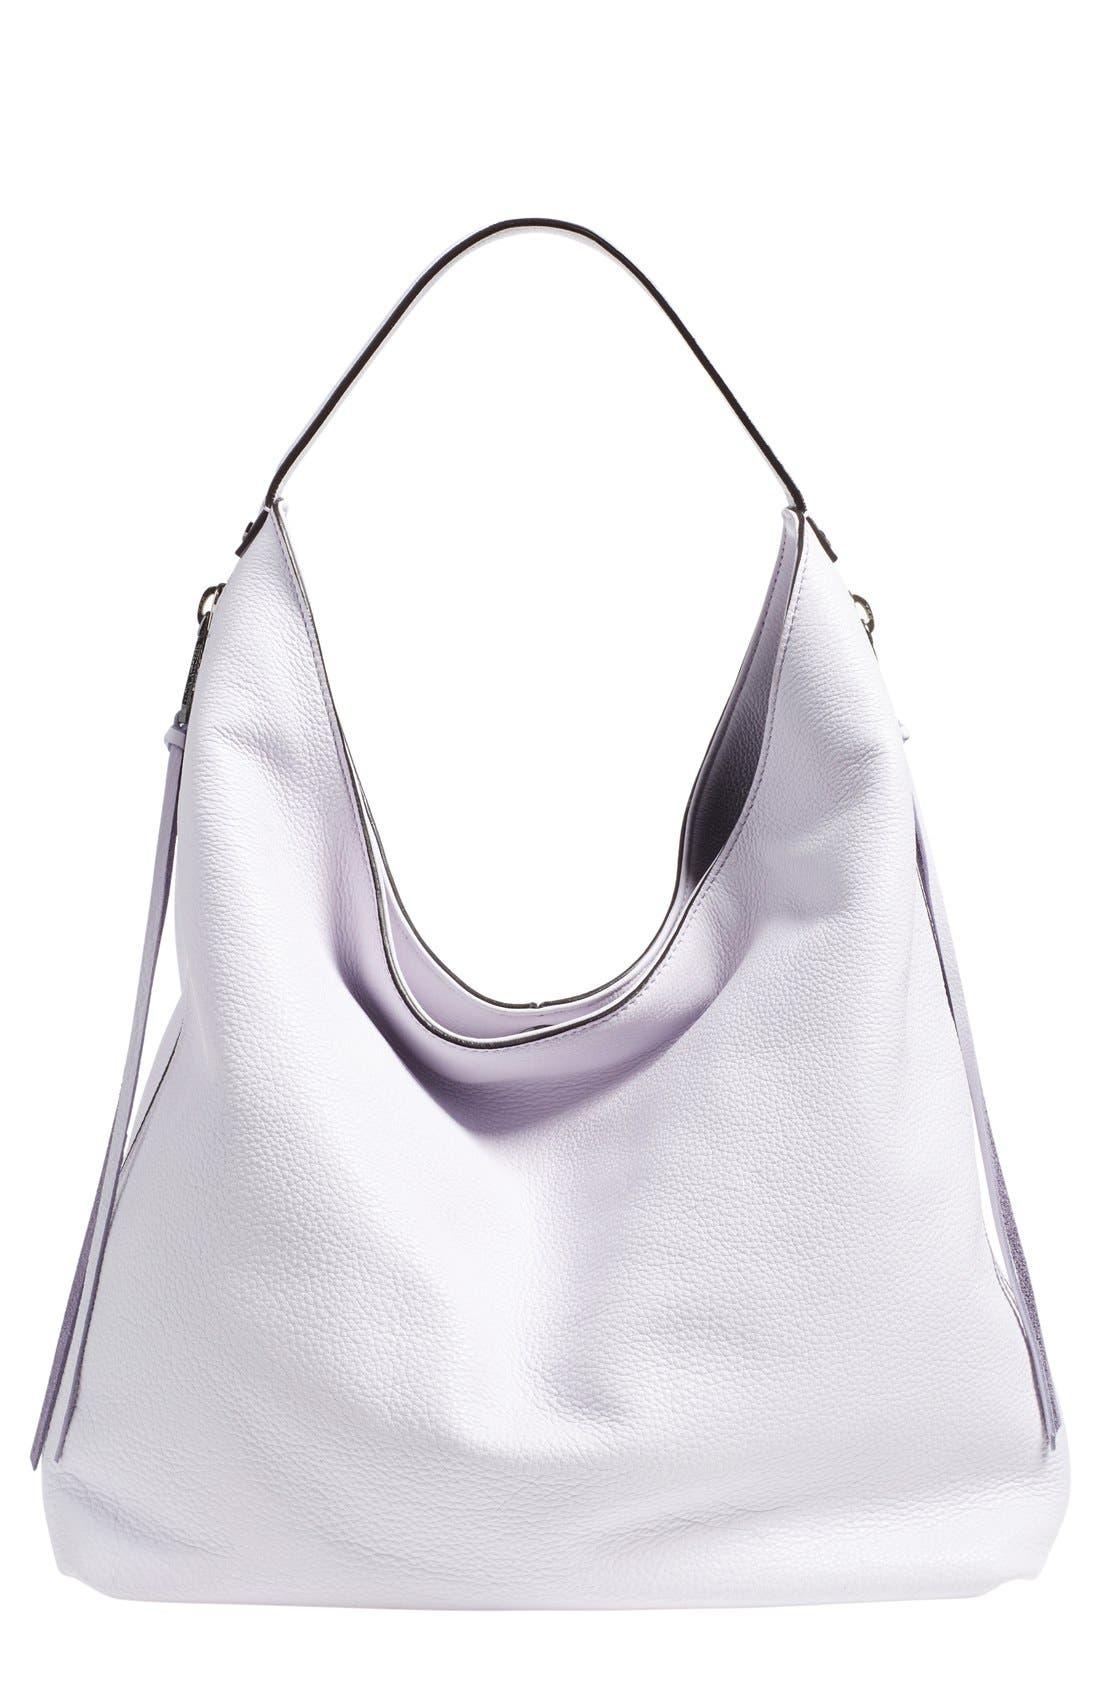 'Bryn' Hobo Bag,                             Main thumbnail 1, color,                             506